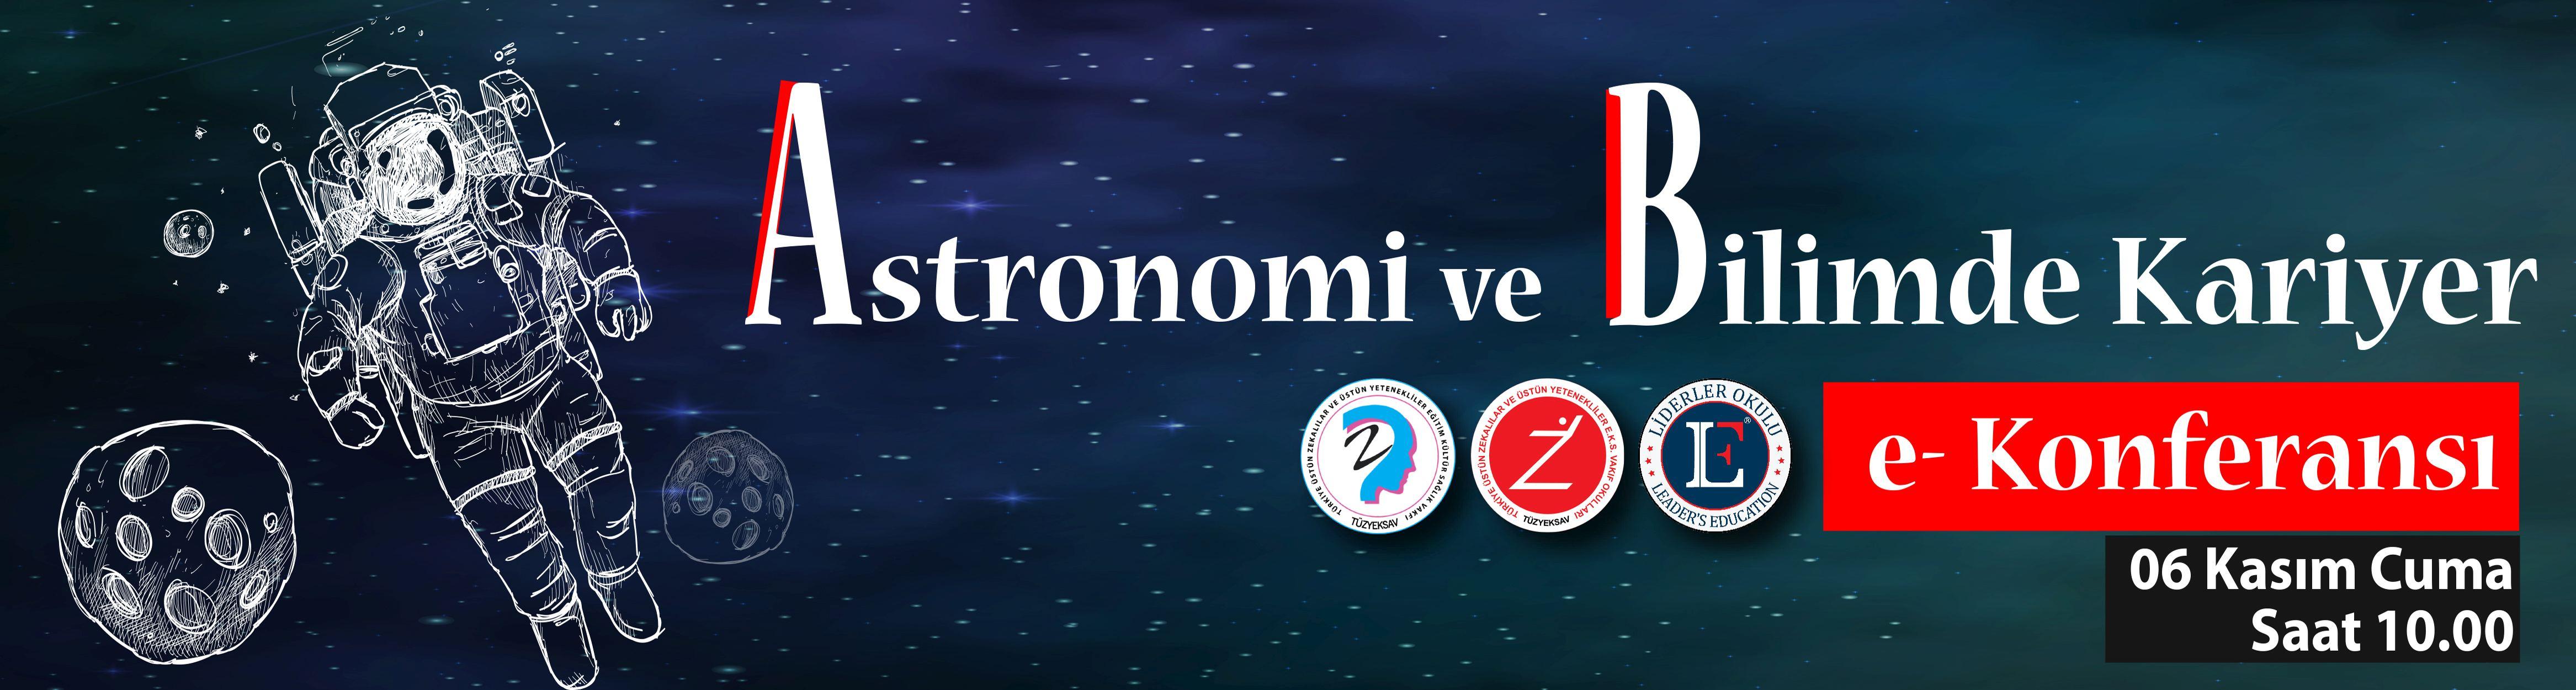 astronomi-banner1